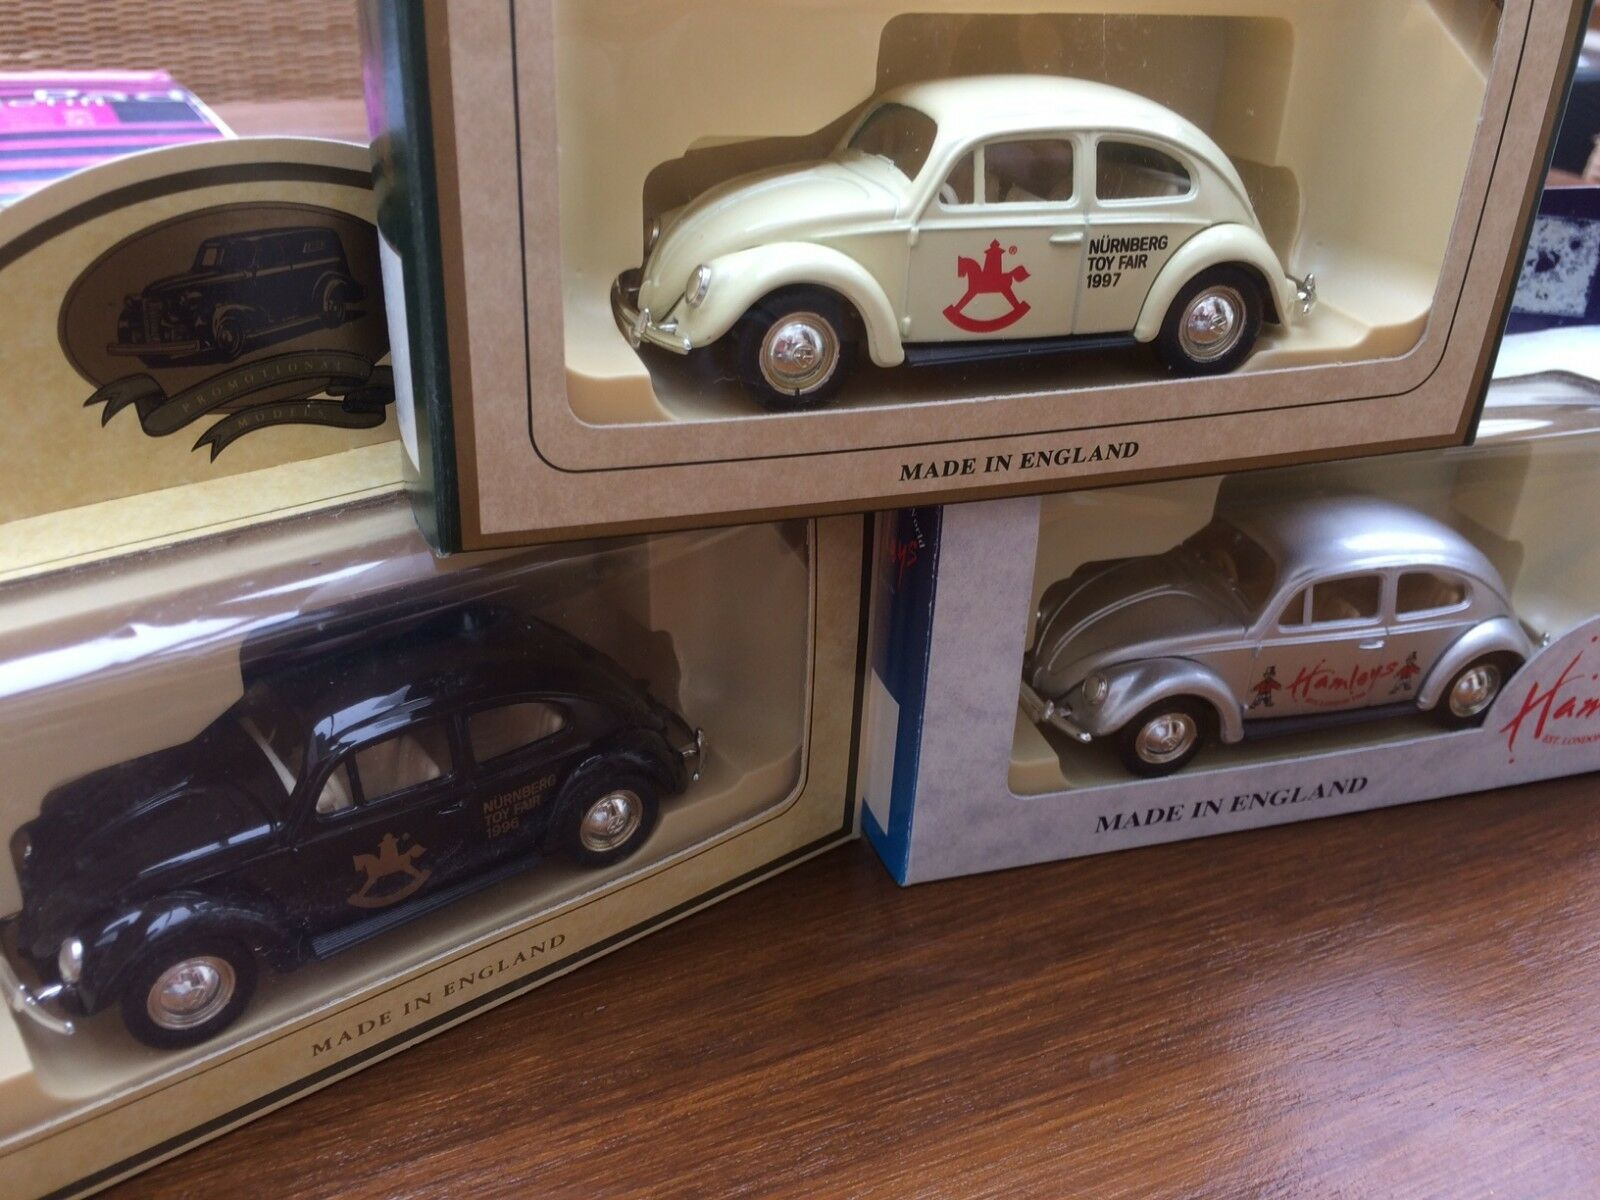 LLEDO DG72002 DG72003 DG72004 LP72-16A VW Beetle Nurnberg Toyfair Hamleys cars